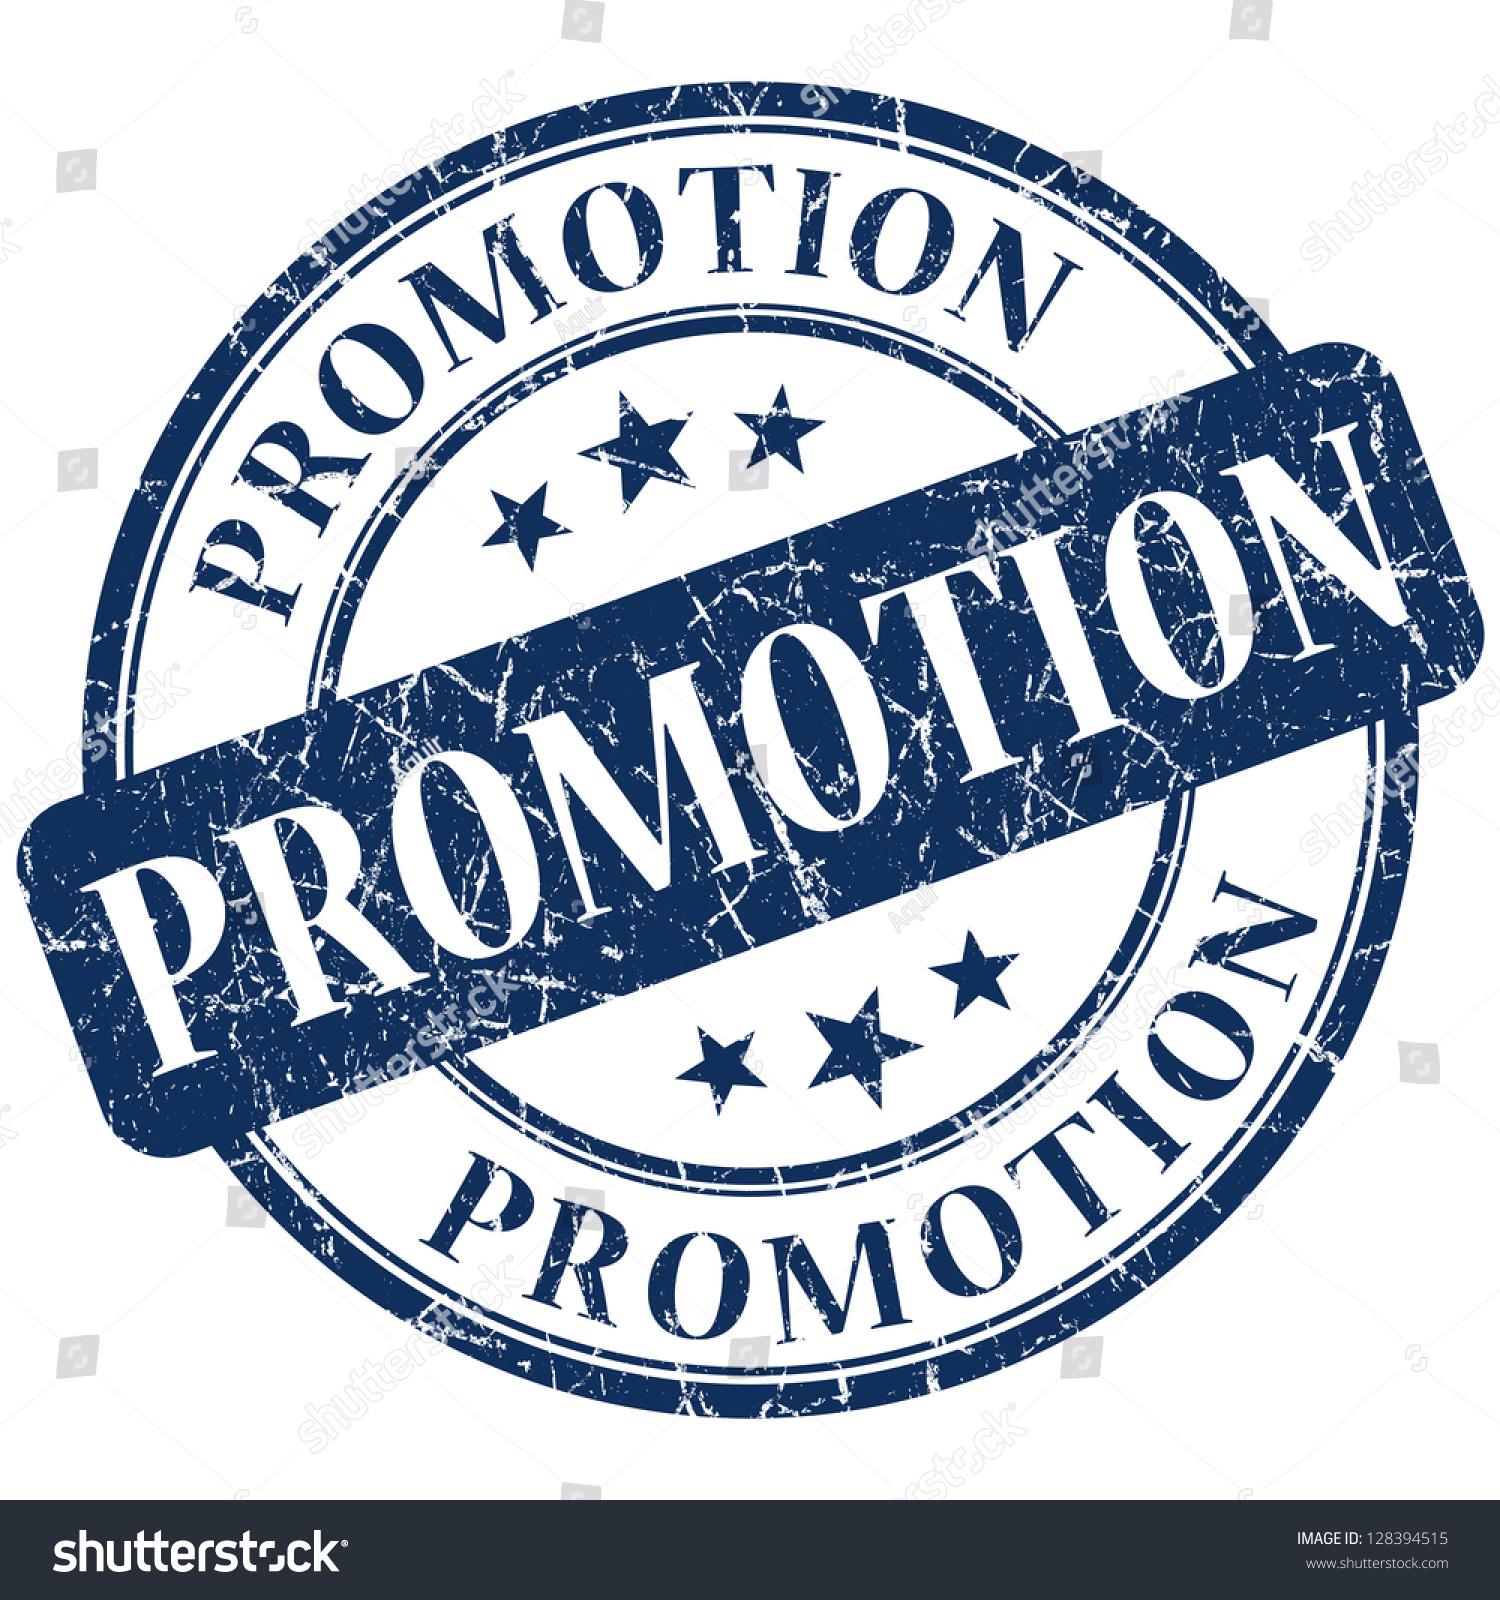 promotion stamp stock illustration 128394515 shutterstock